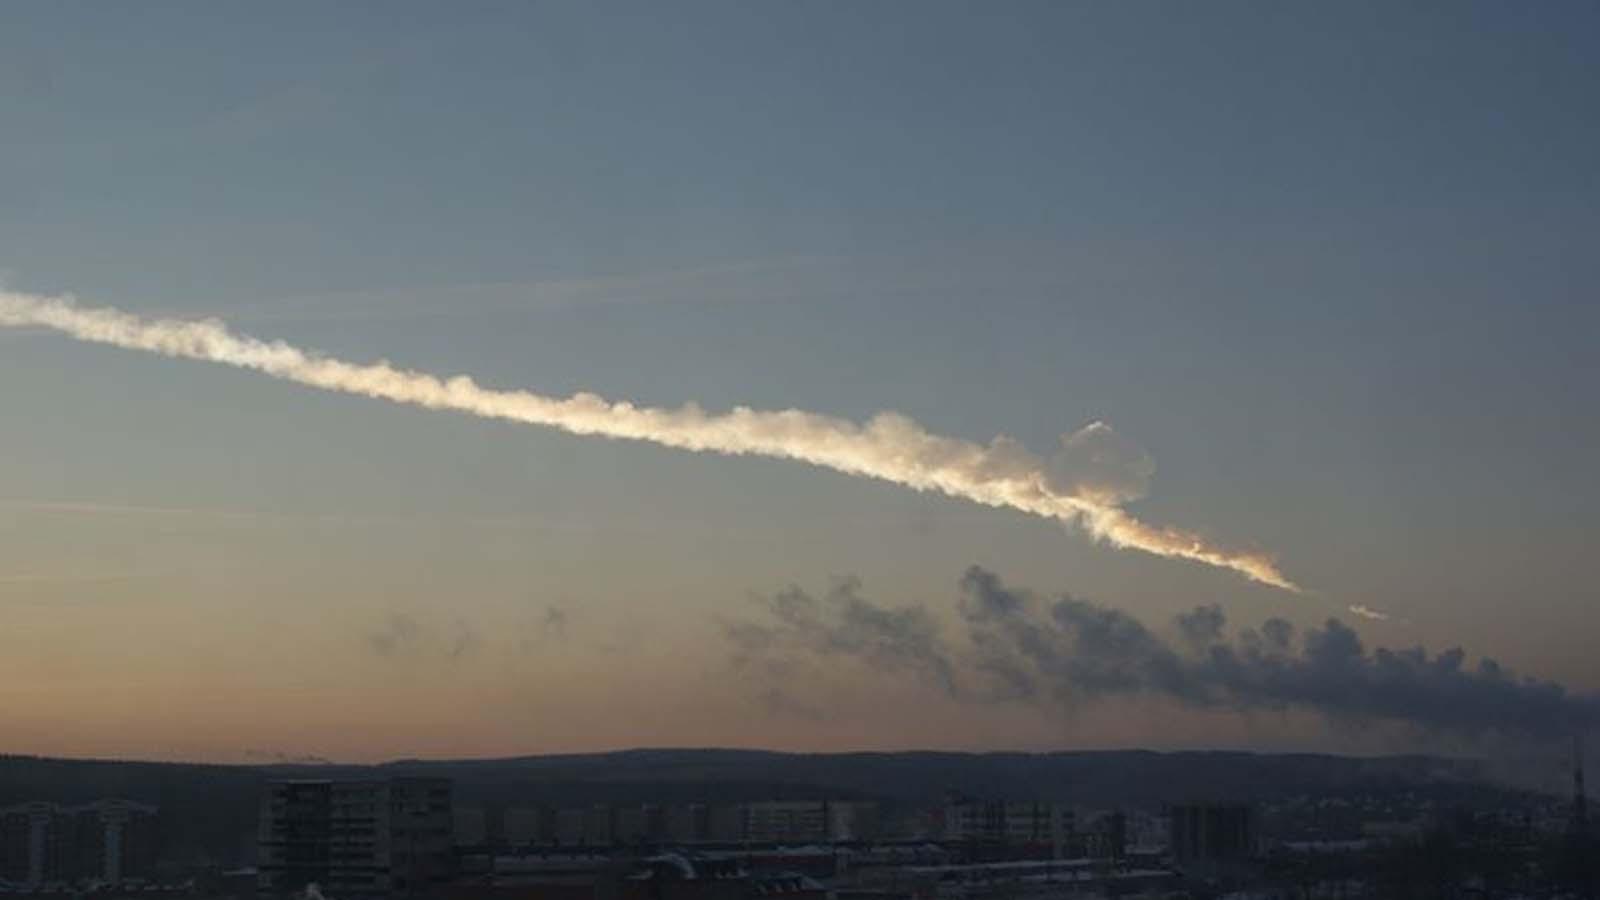 Ekaterinburg_view_of_2013_meteor_event-pano.jpg